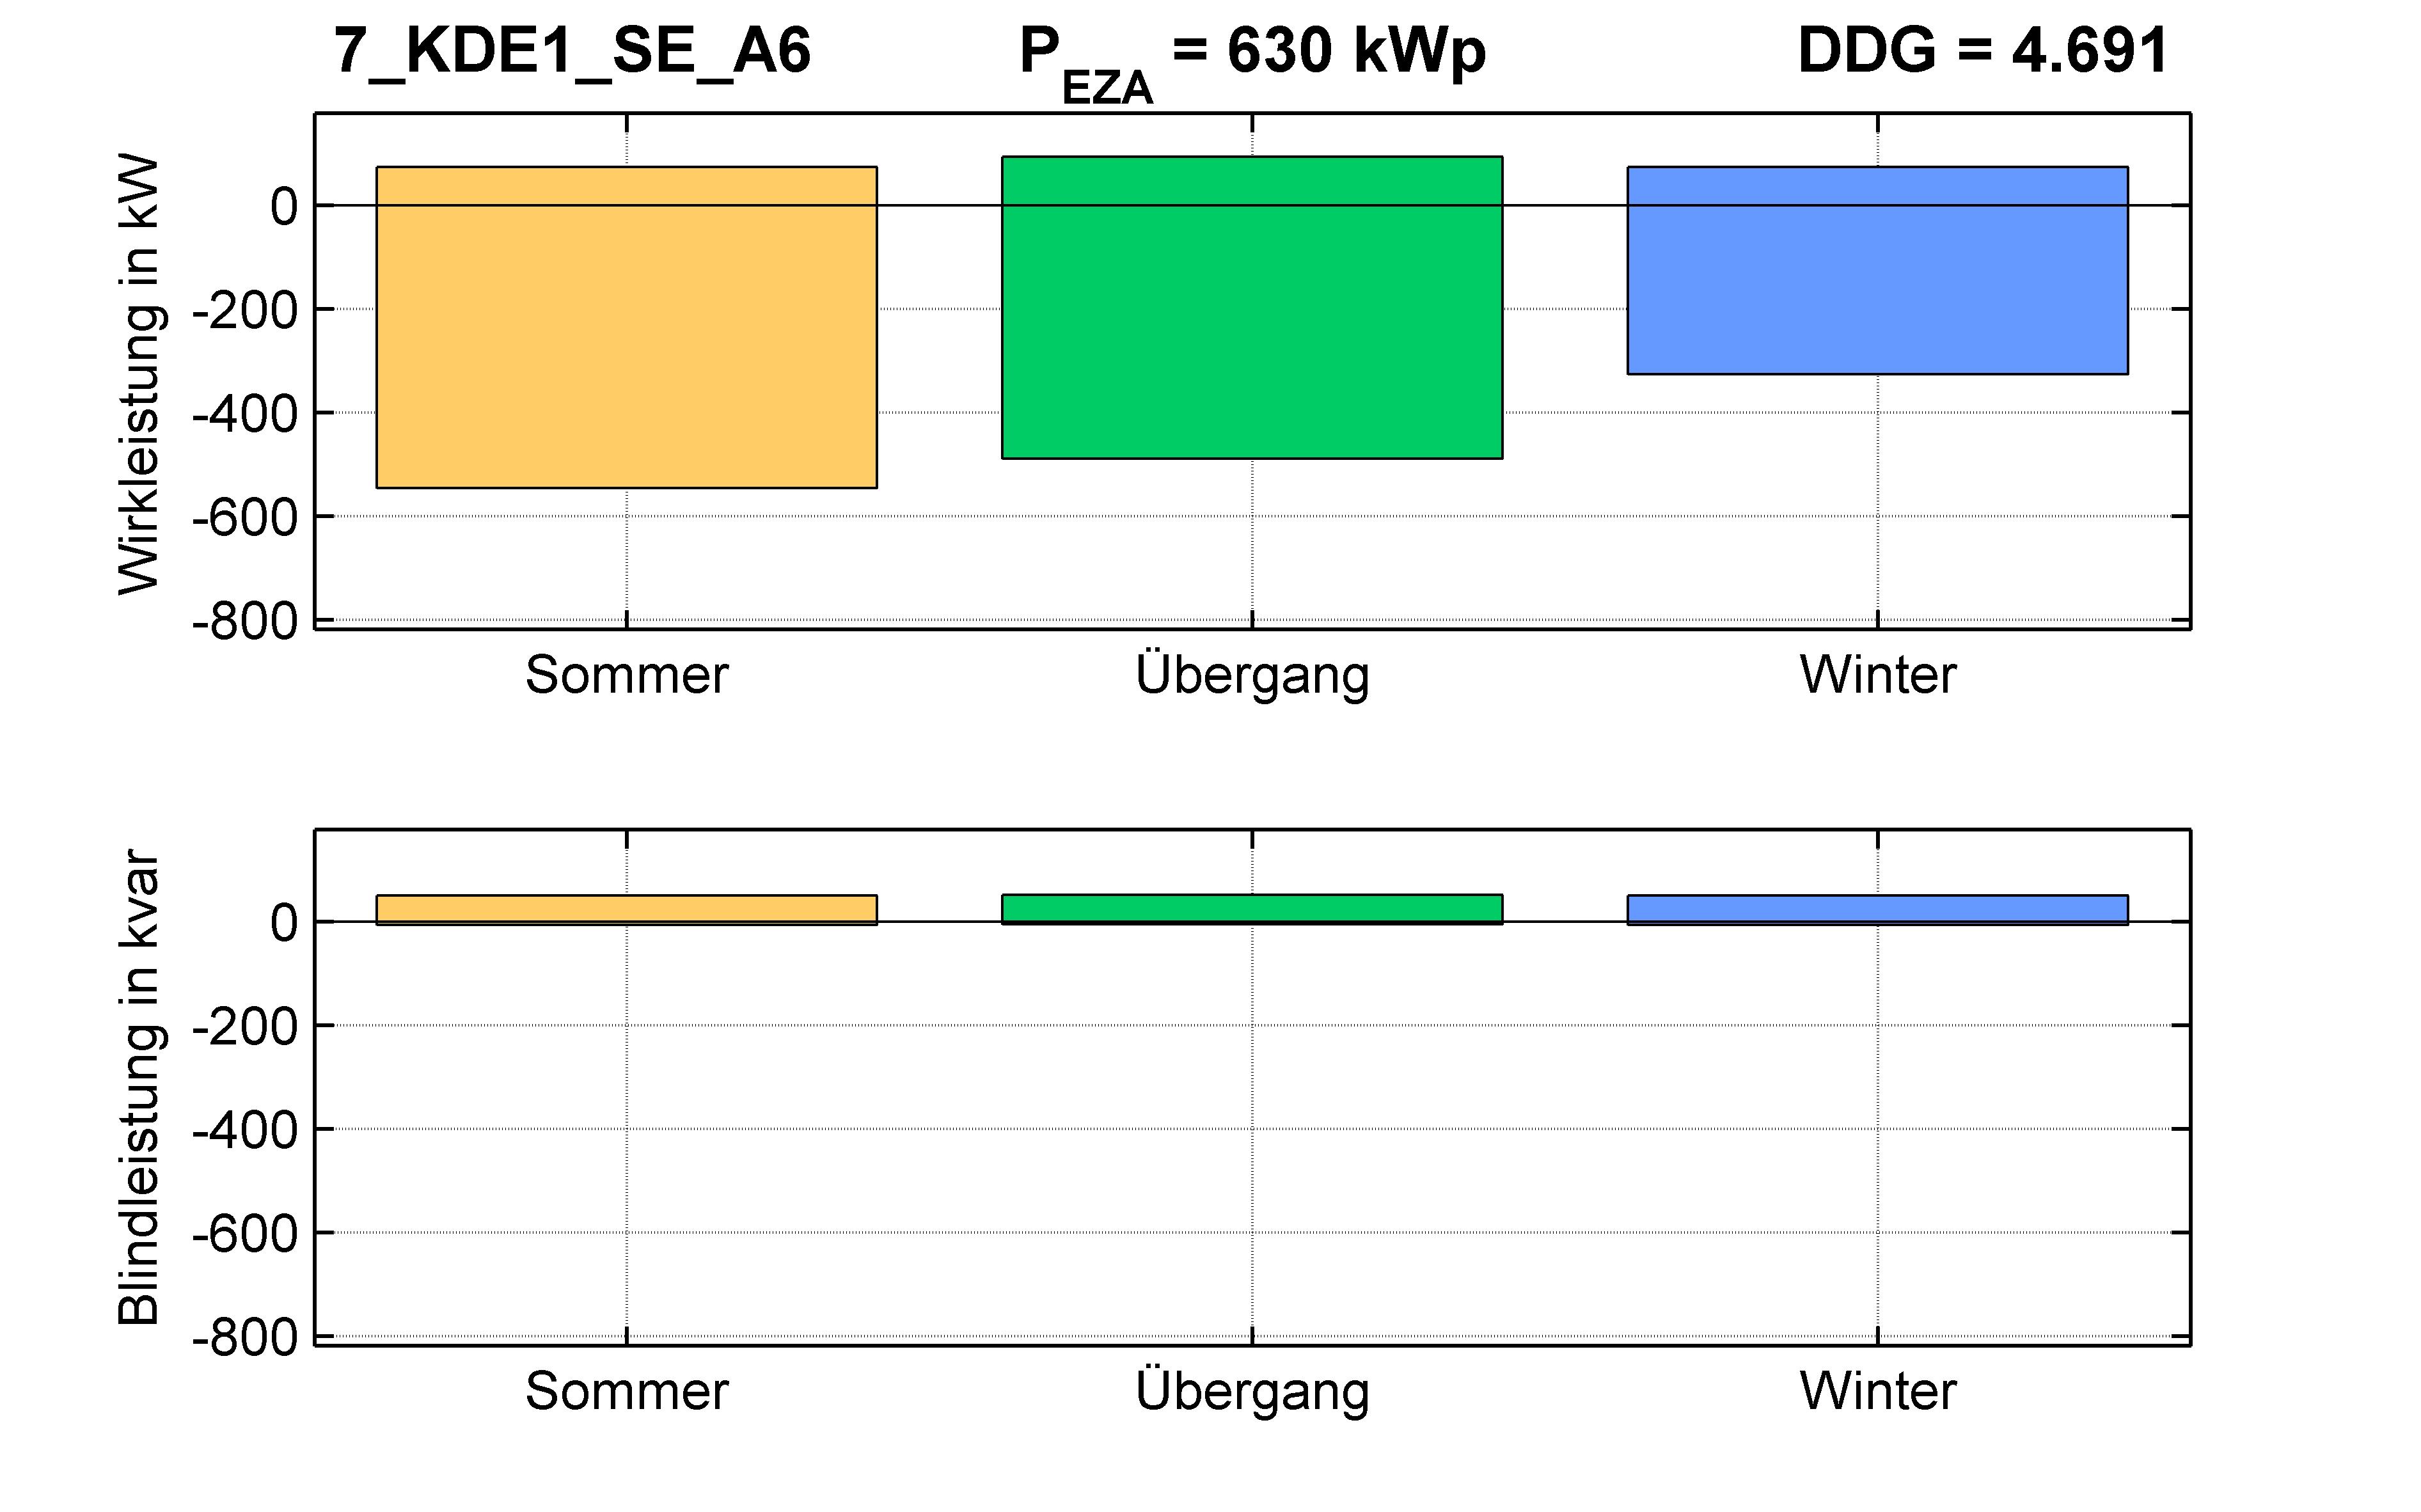 KDE1 | Längsregler (SE) A6 | PQ-Bilanz